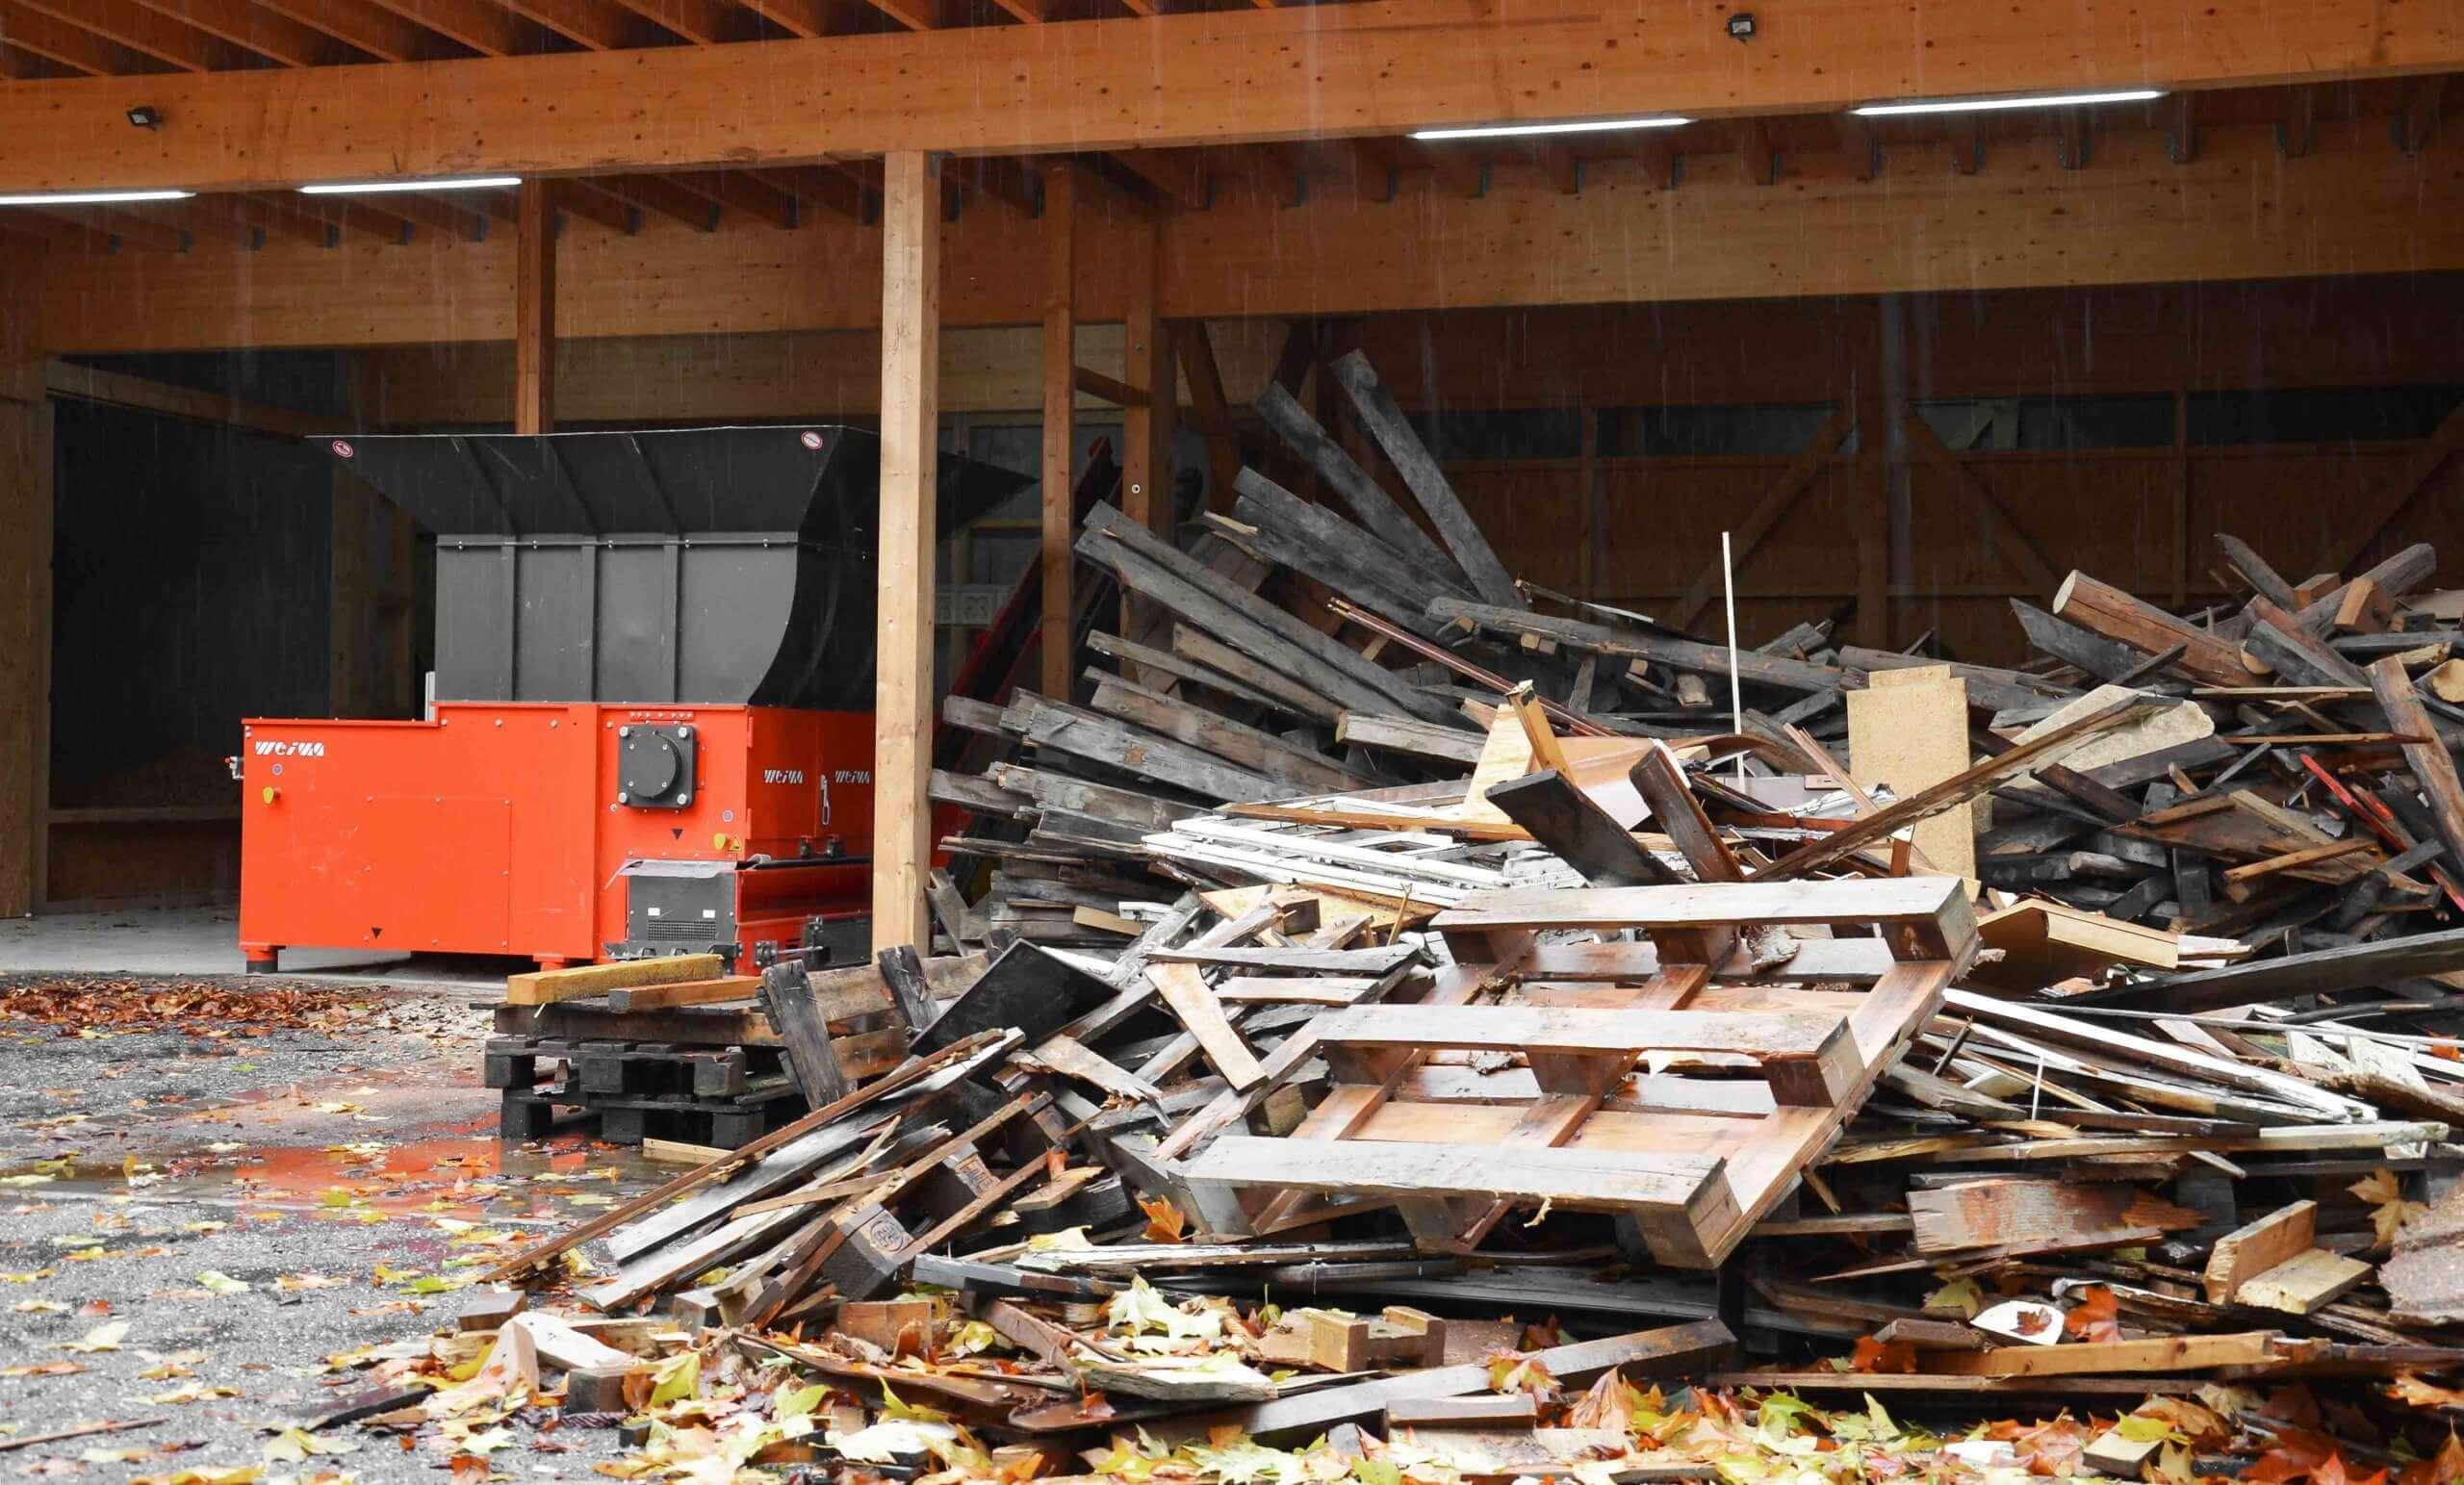 Wood waste beside WEIMA shredder